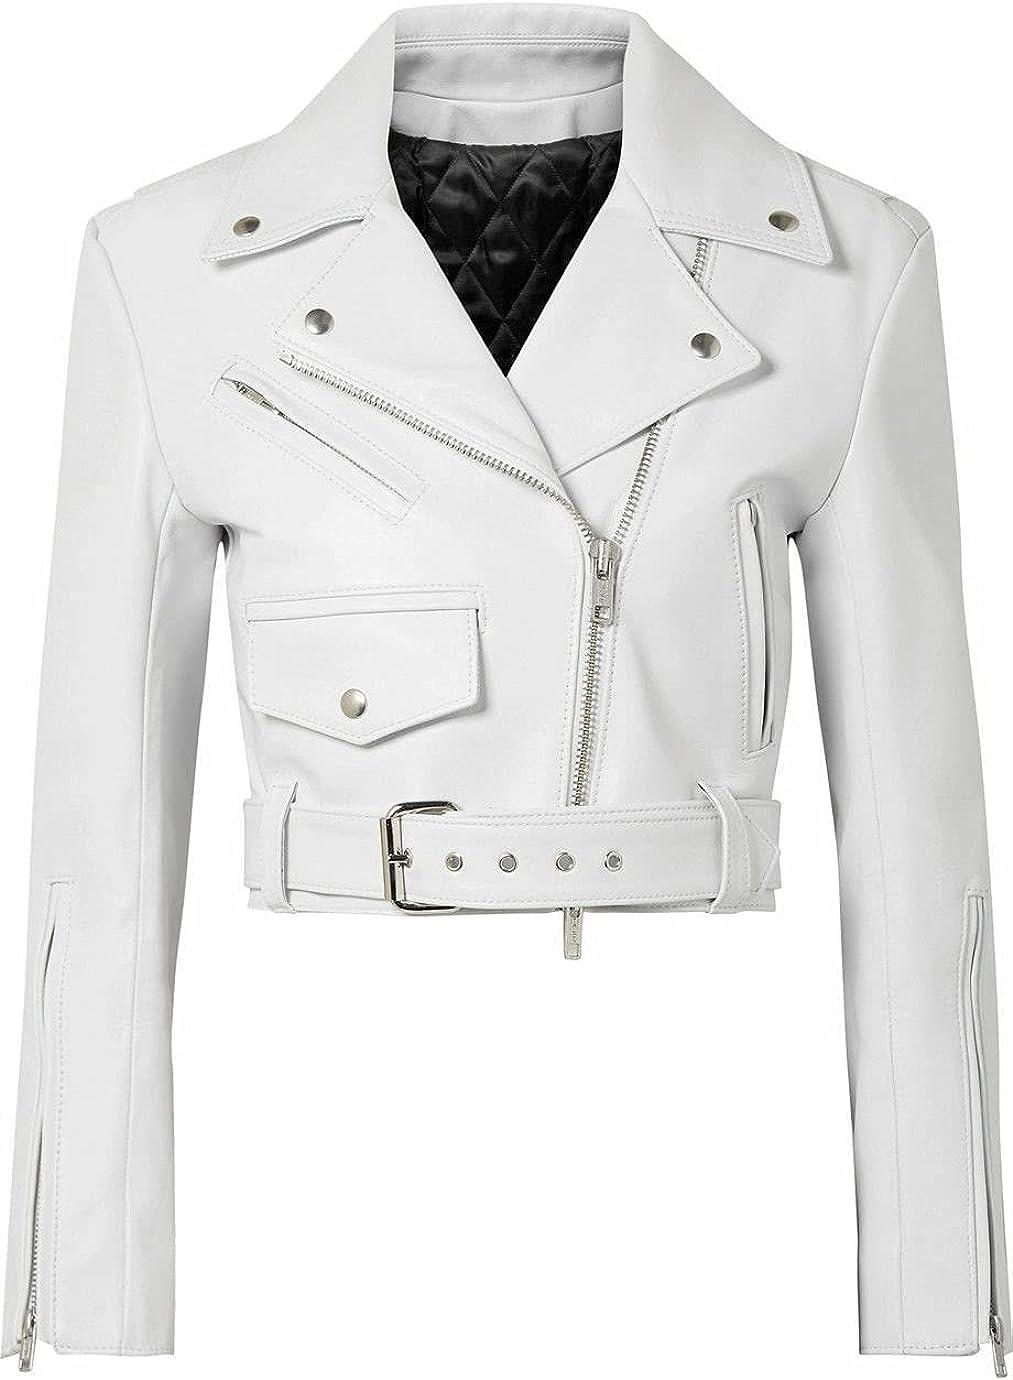 UGFashions Women's White Brando Motorcycle Short Body Cropped Belted Vintage Leather Jacket